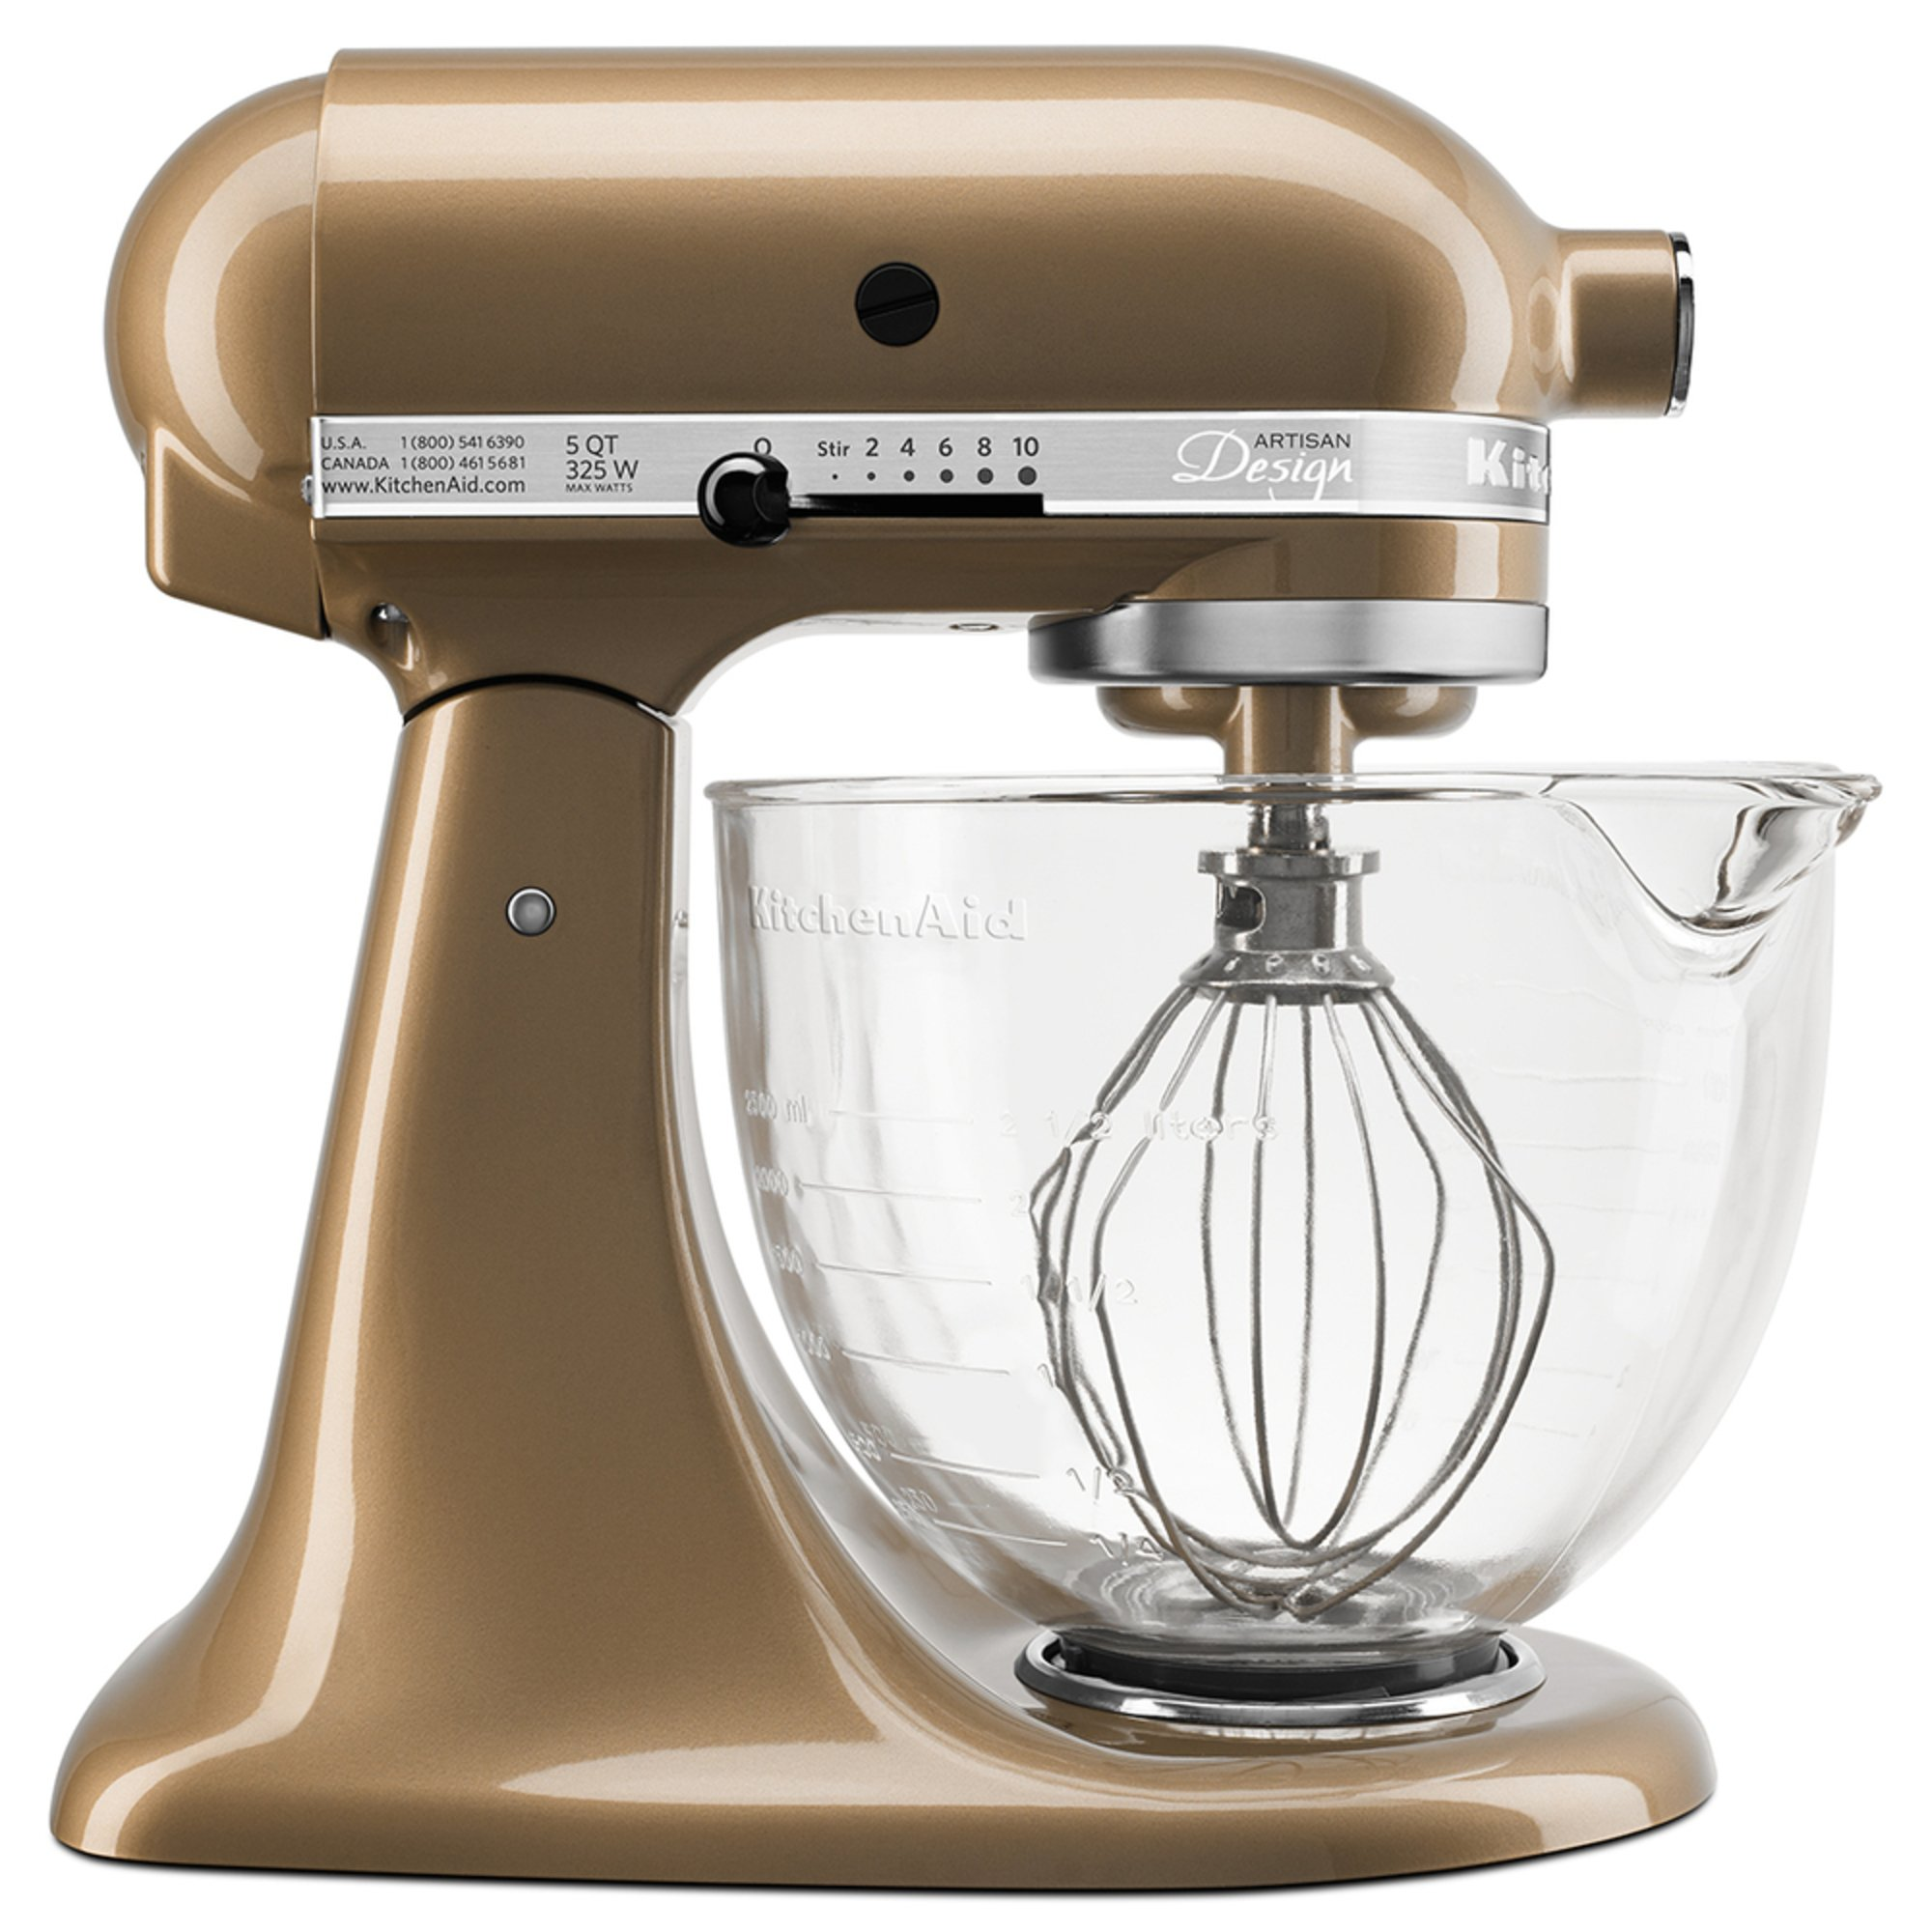 Kitchenaid Artisan Design Series 5-quart Stand Mixer With Glass ...